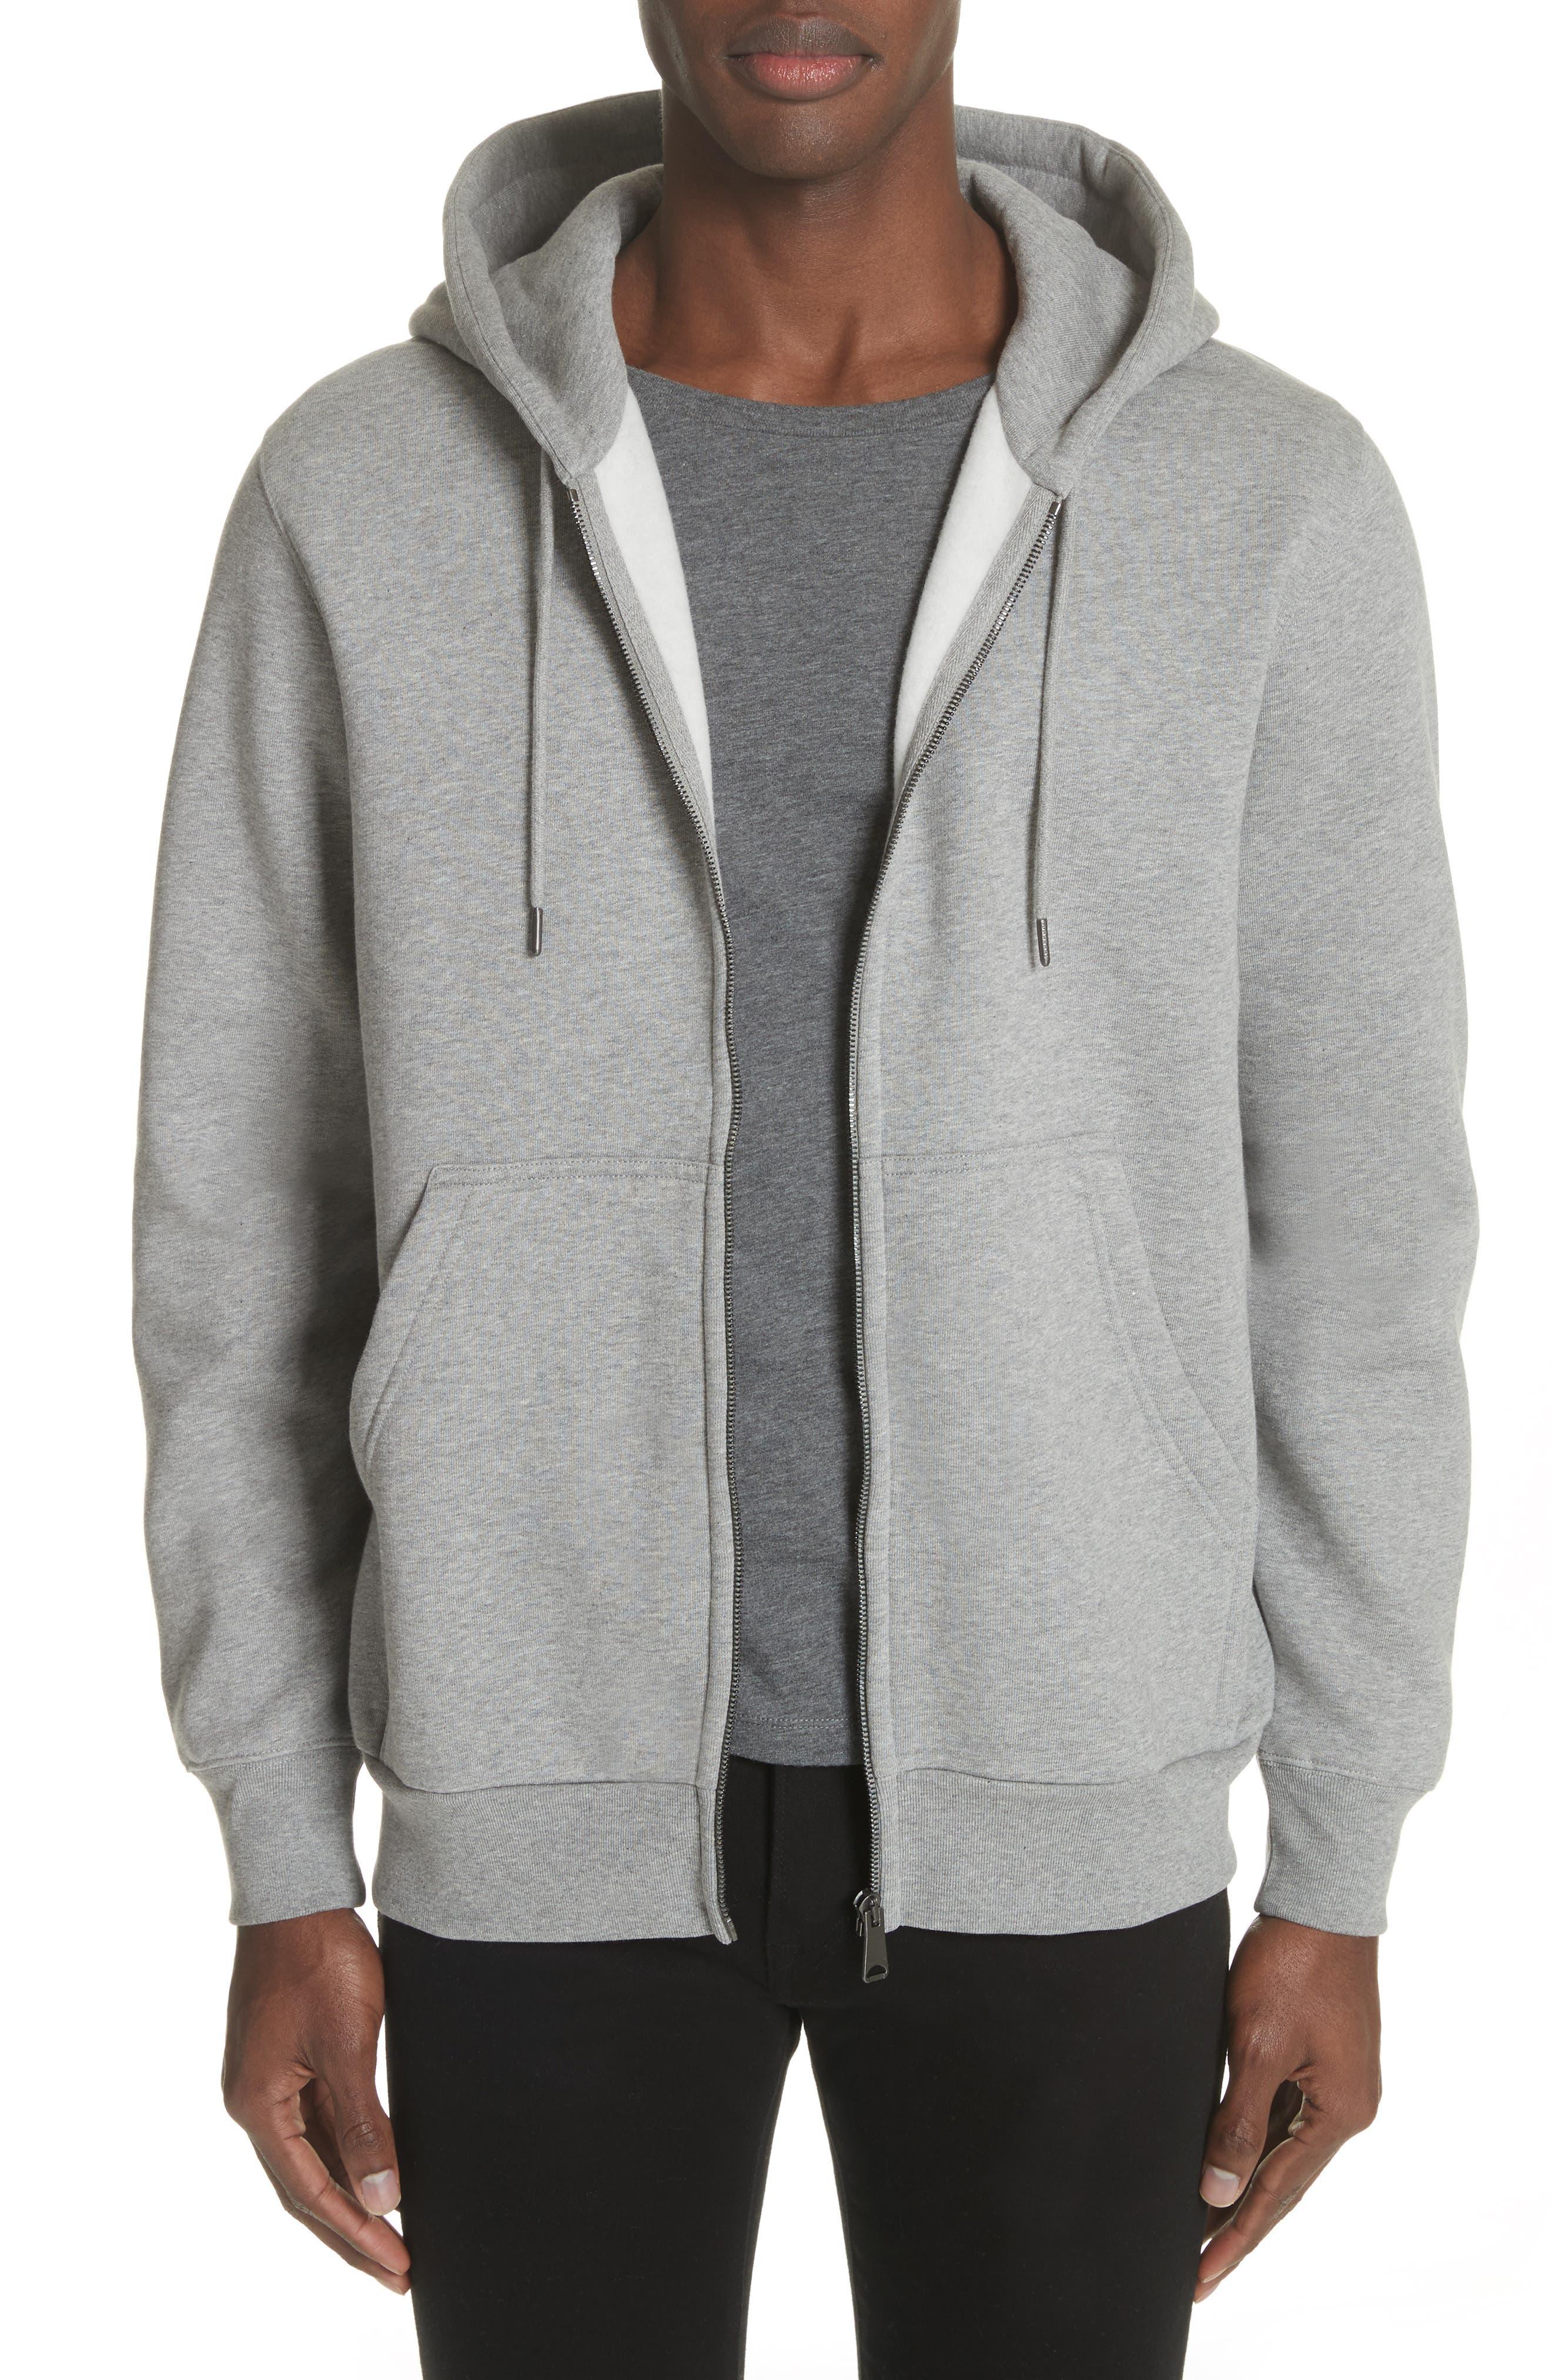 Kenton Regular Fit Full Zip Fleece Hoodie,                         Main,                         color, Pale Grey Melange